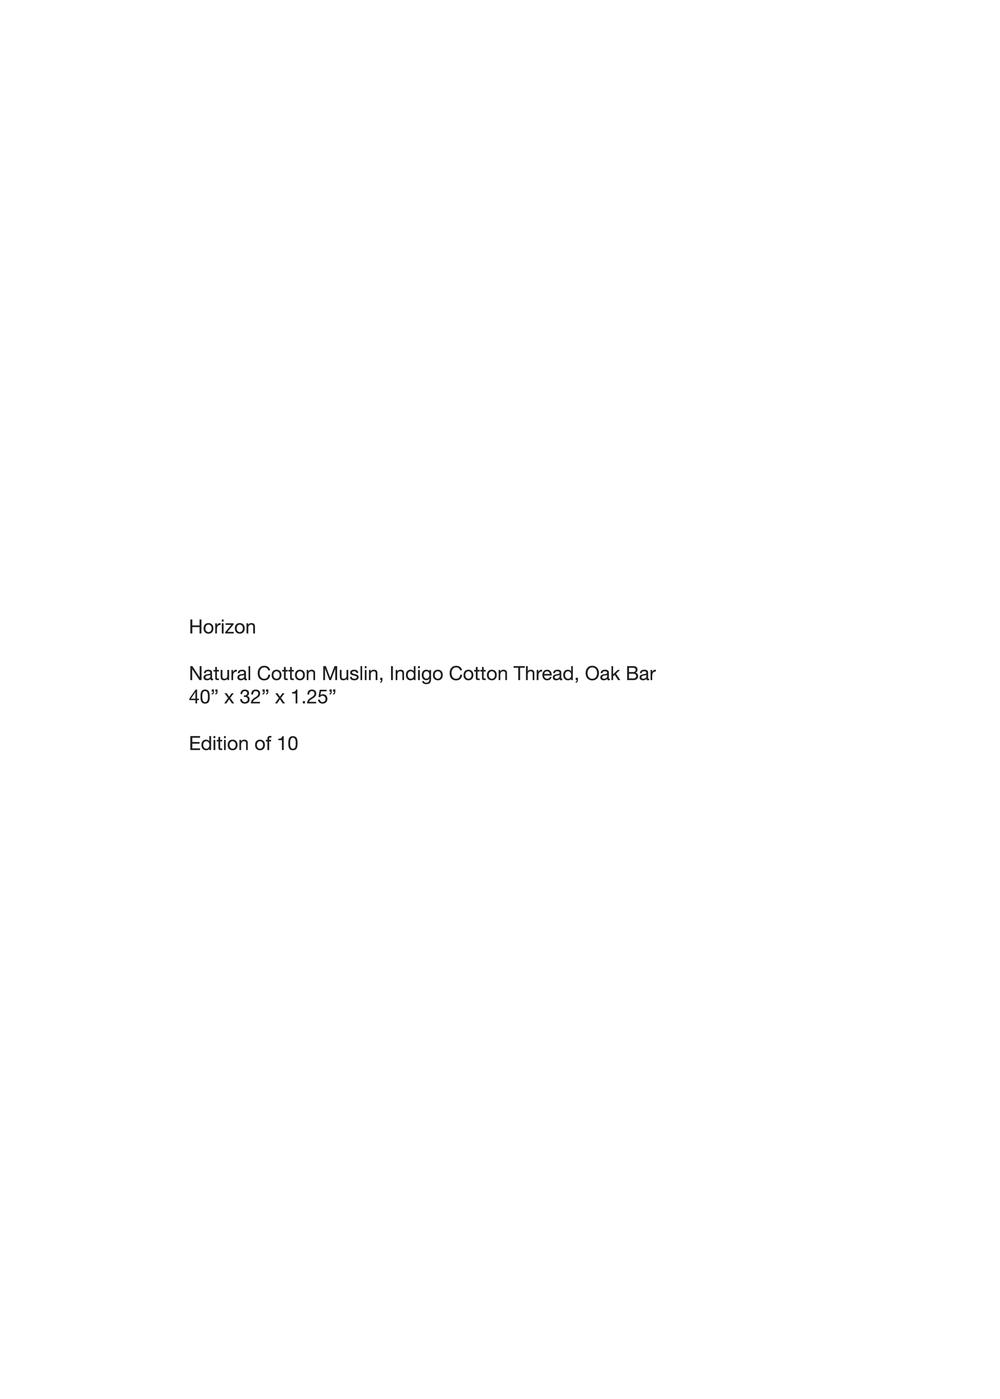 Nicole Patel Horizon Text-01.png